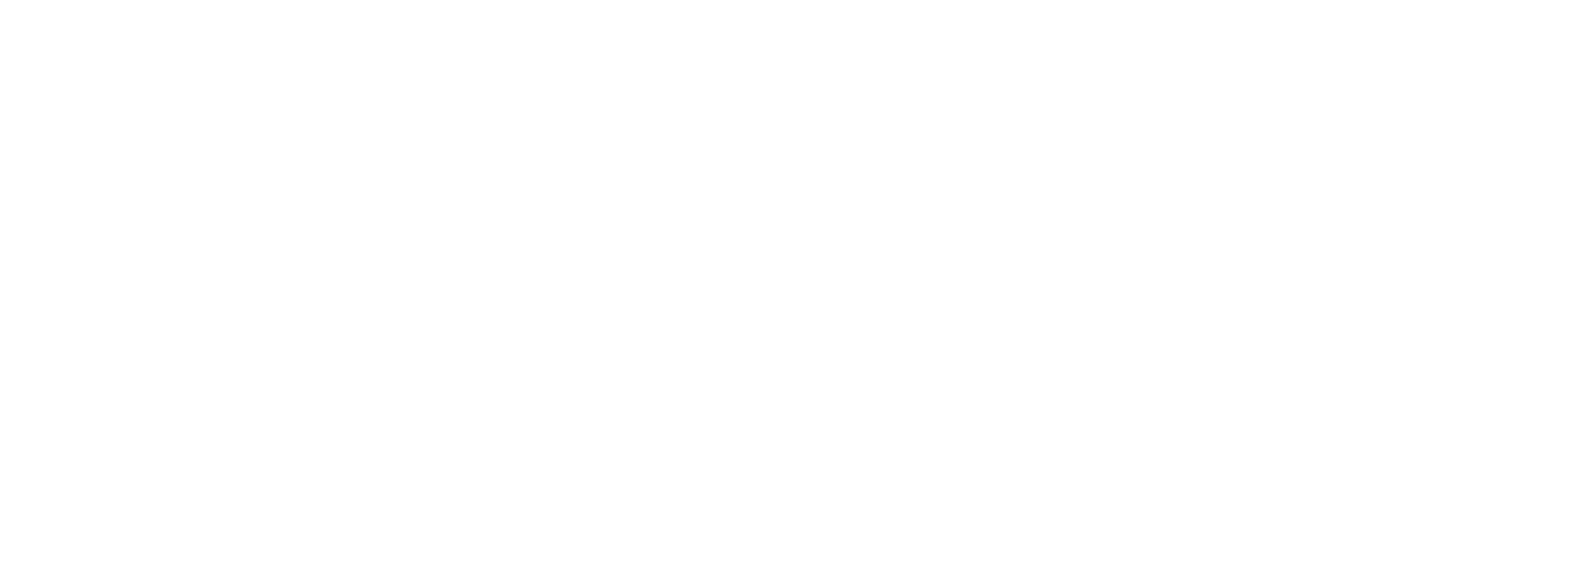 MARBELLA SMART